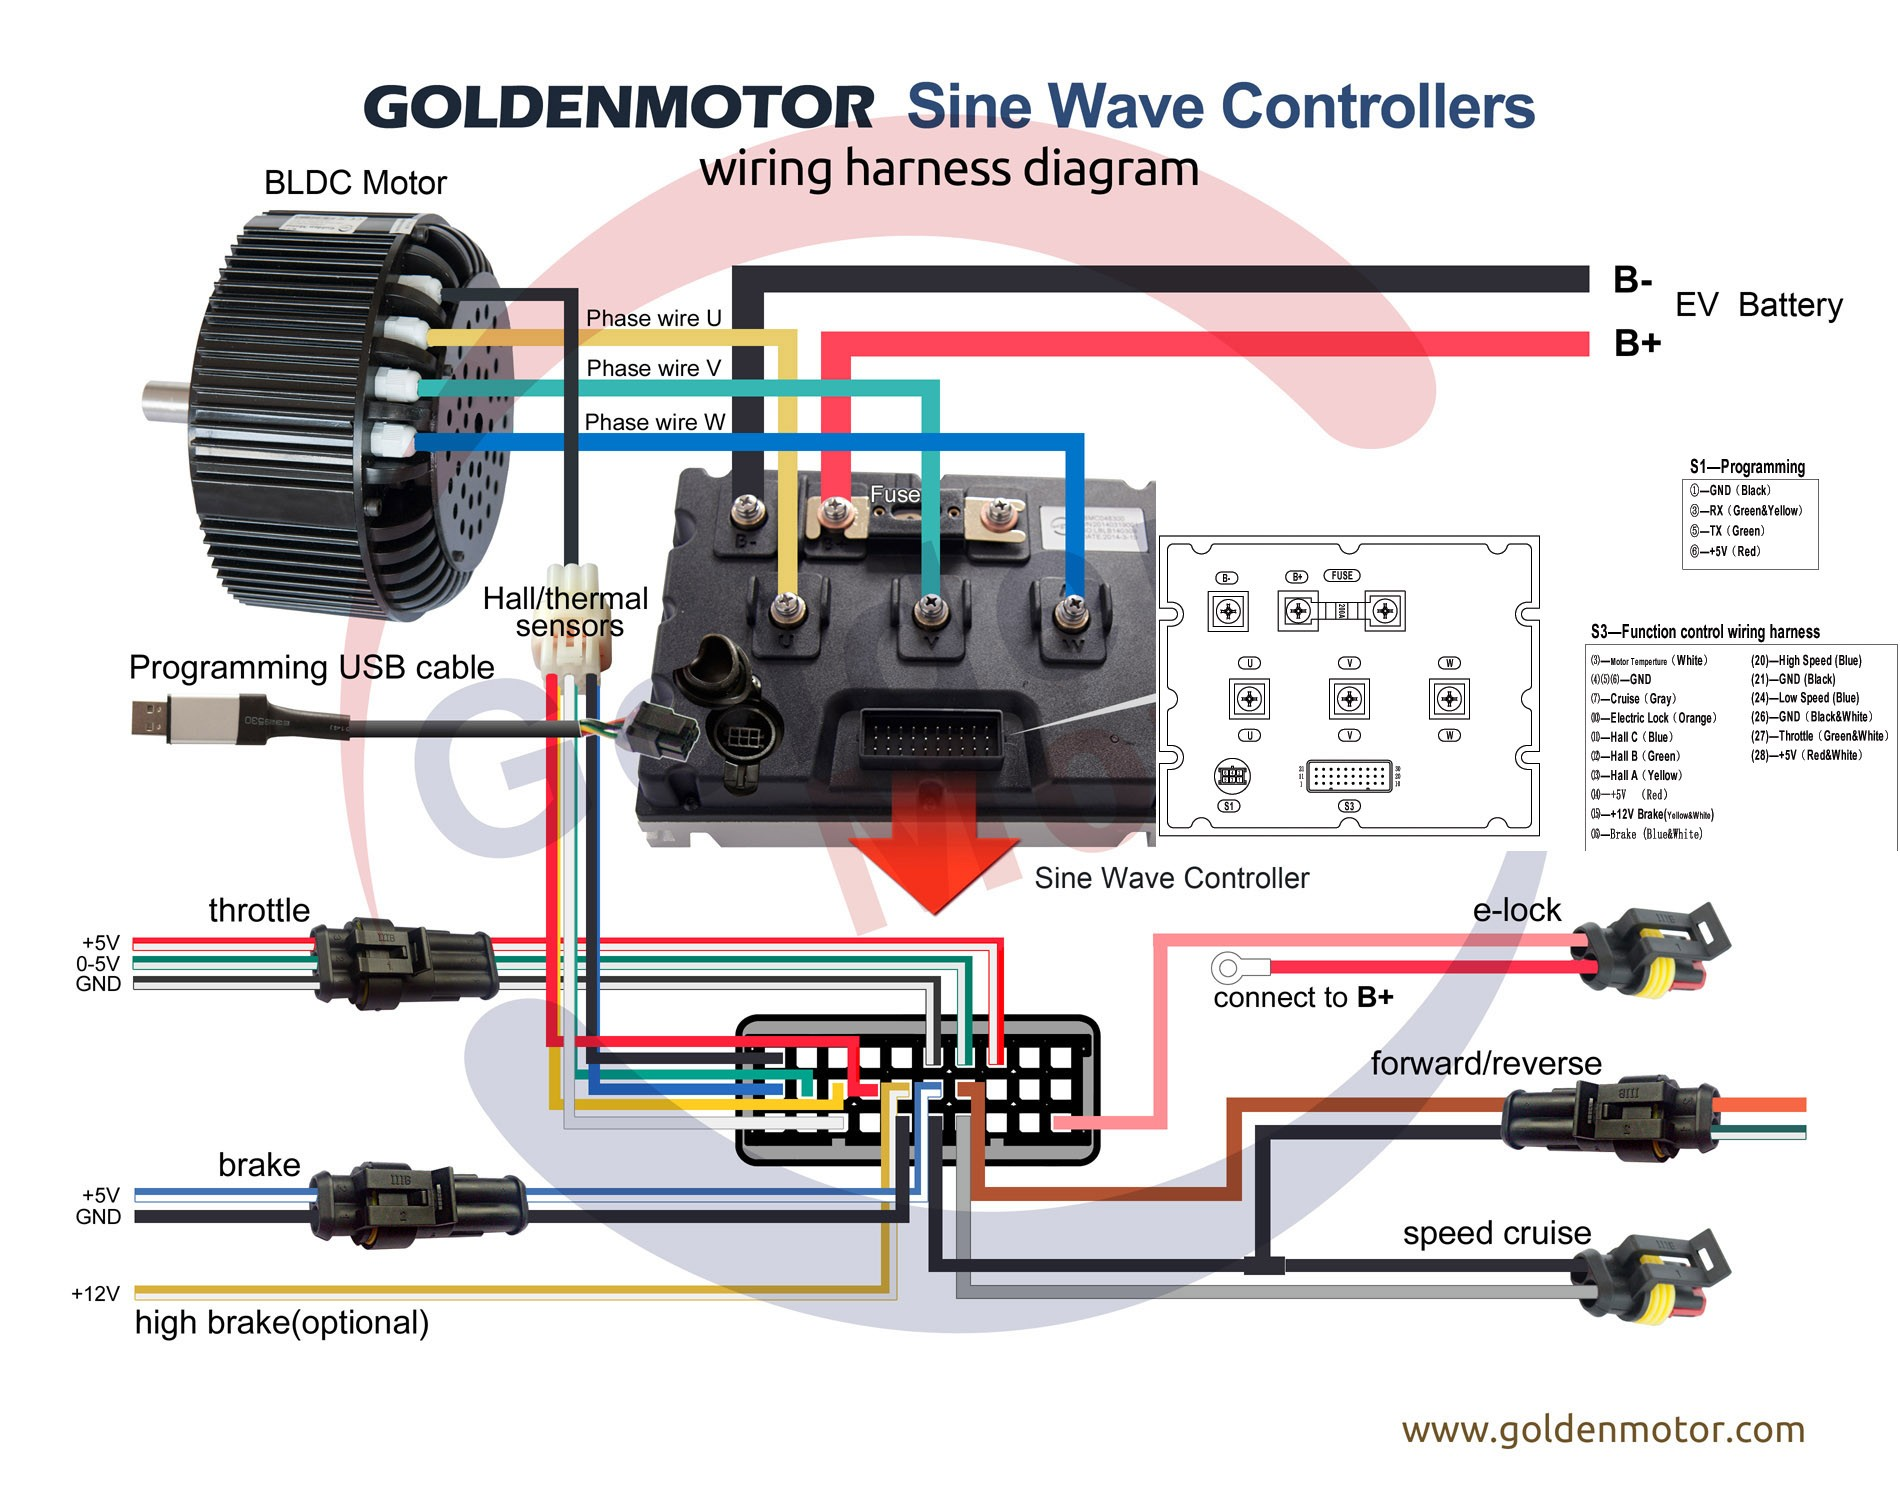 Car Engine Diagram Pdf Dorable Electric Wiring Pdf Embellishment Electrical Diagram Ideas Of Car Engine Diagram Pdf